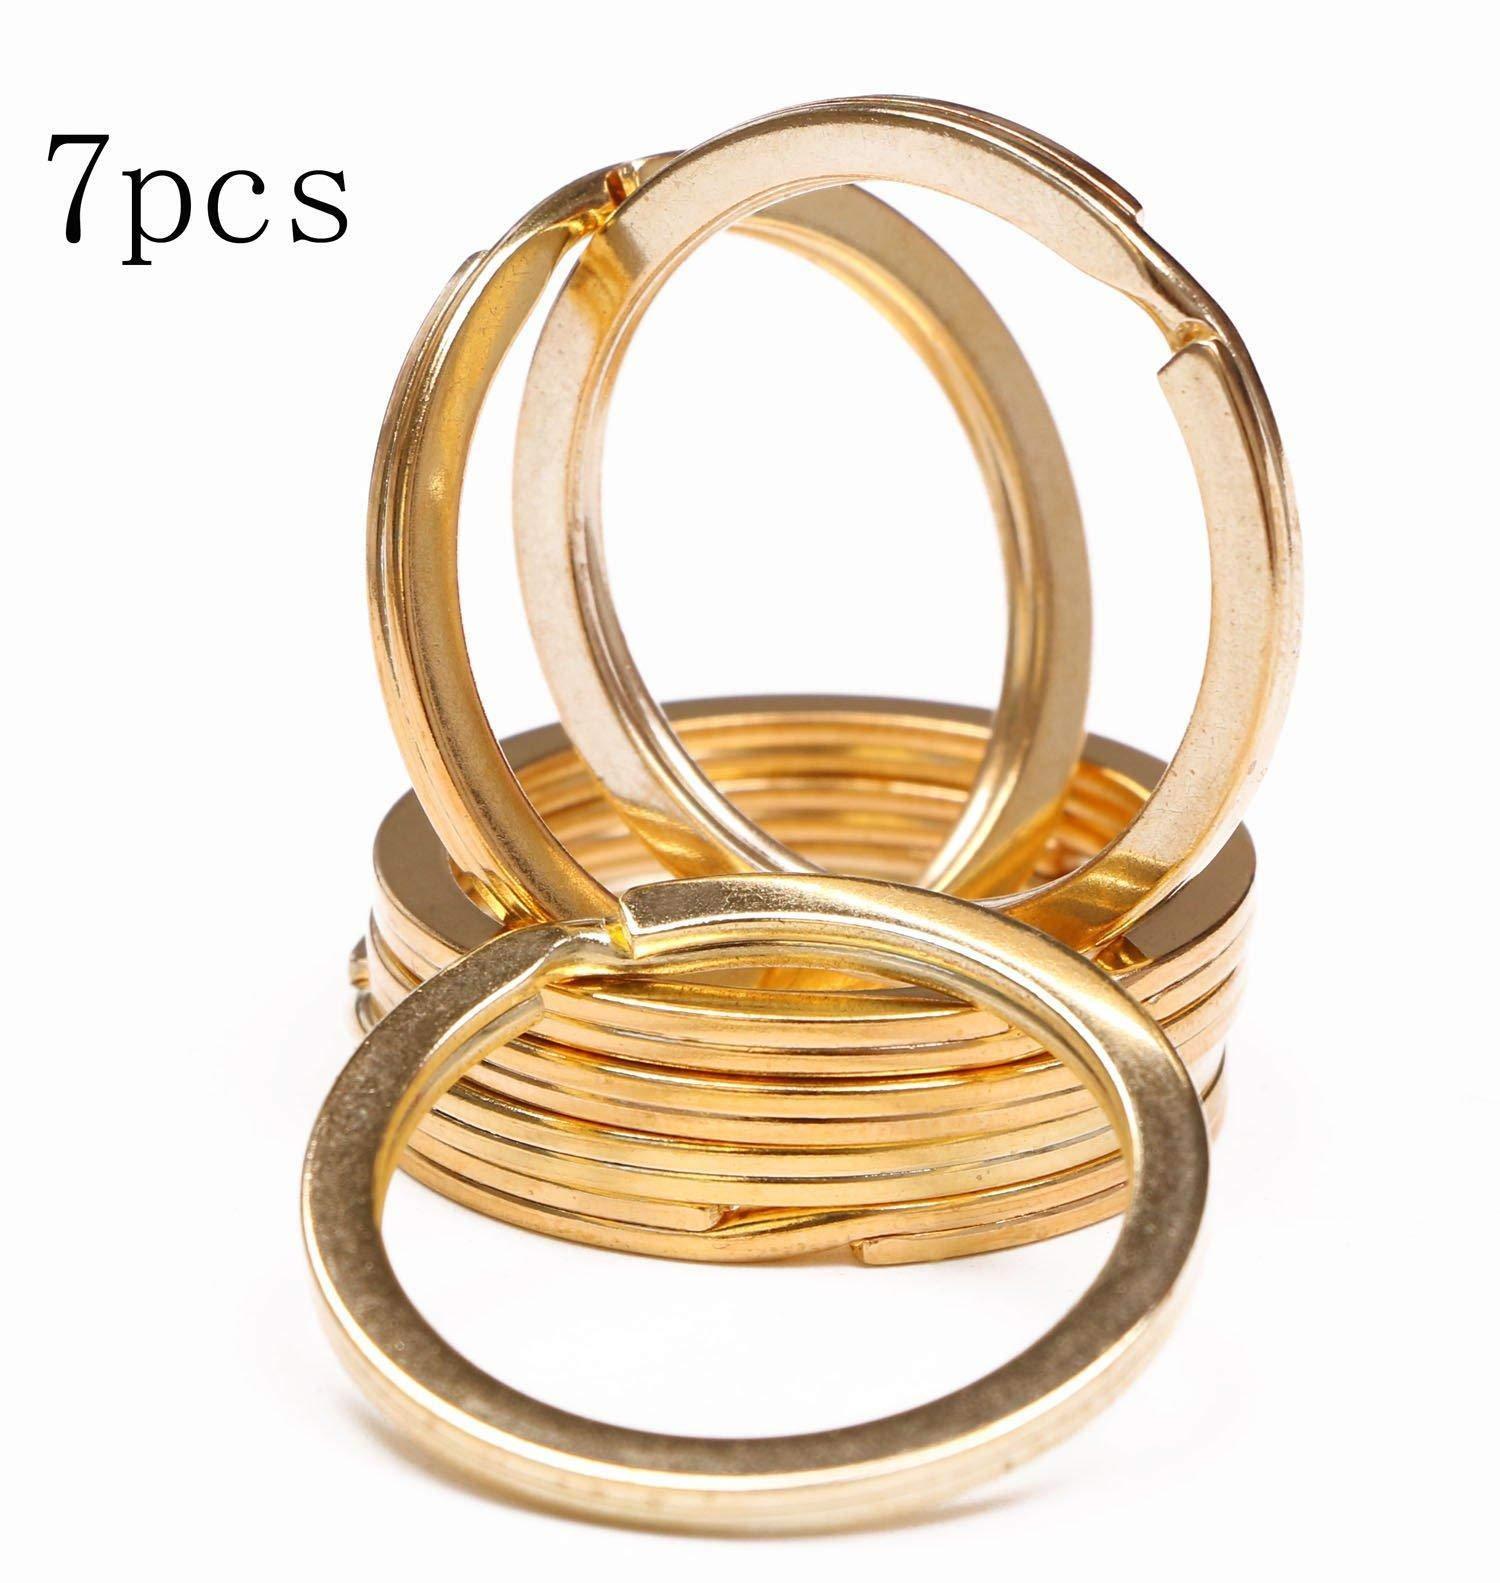 Oldlila 1.2 Inch Flat Split Key Chain Ring Connector Metal Keychain Part Keyring Clip Loop Holder (Gold, 7PCS)